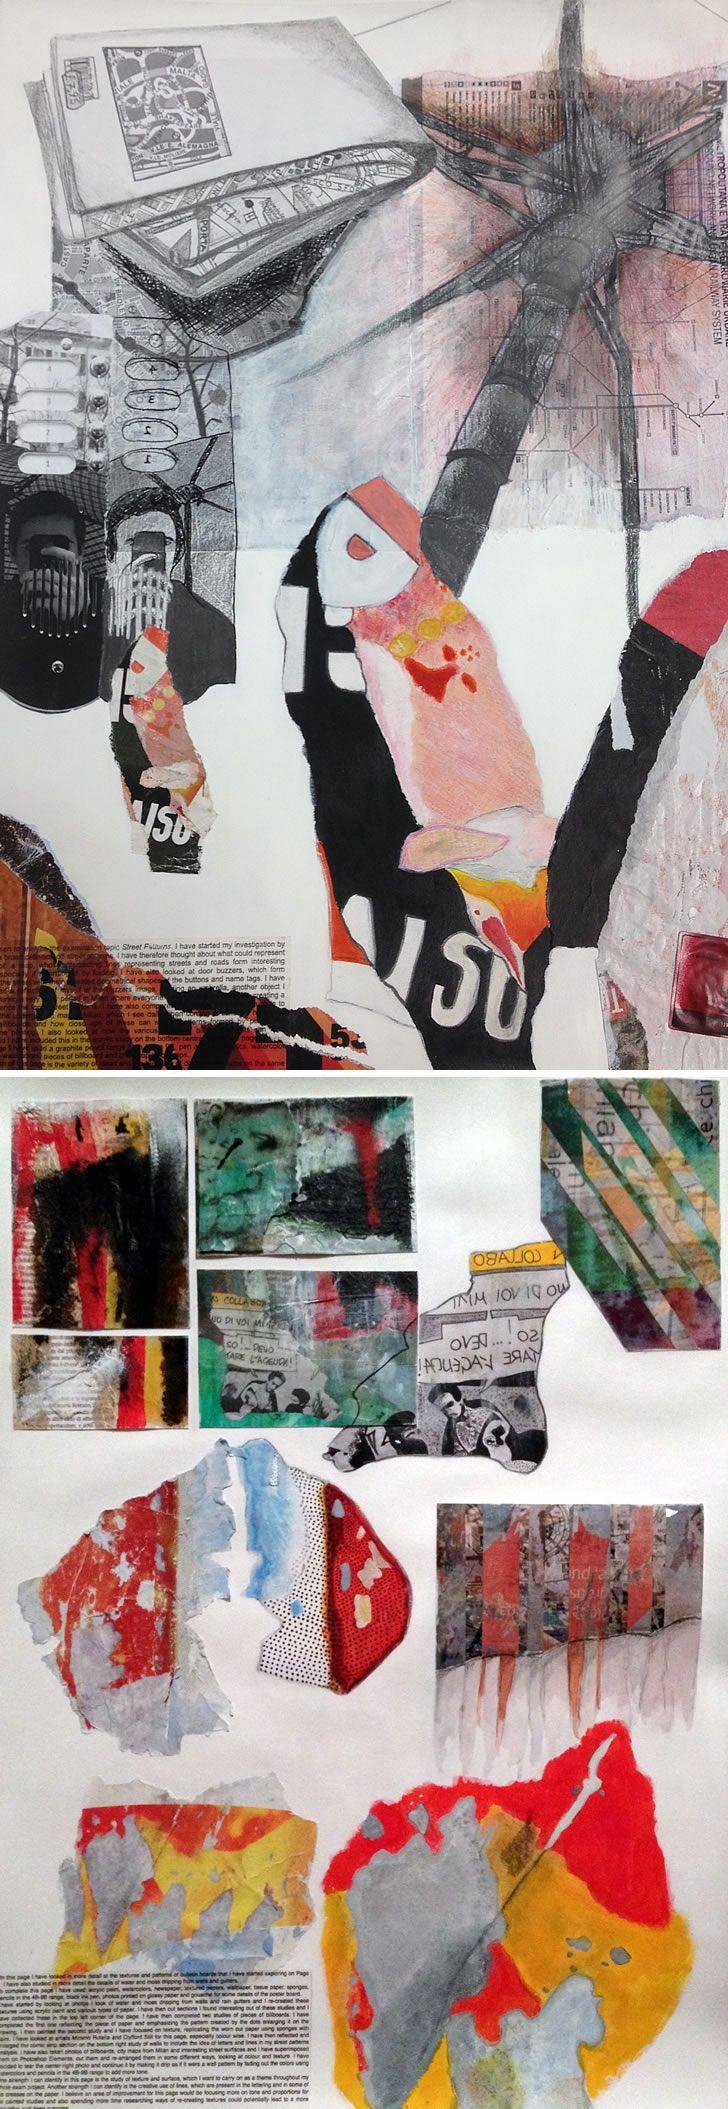 74 best Art stuff I need!!! images on Pinterest | Pencil boxes ...